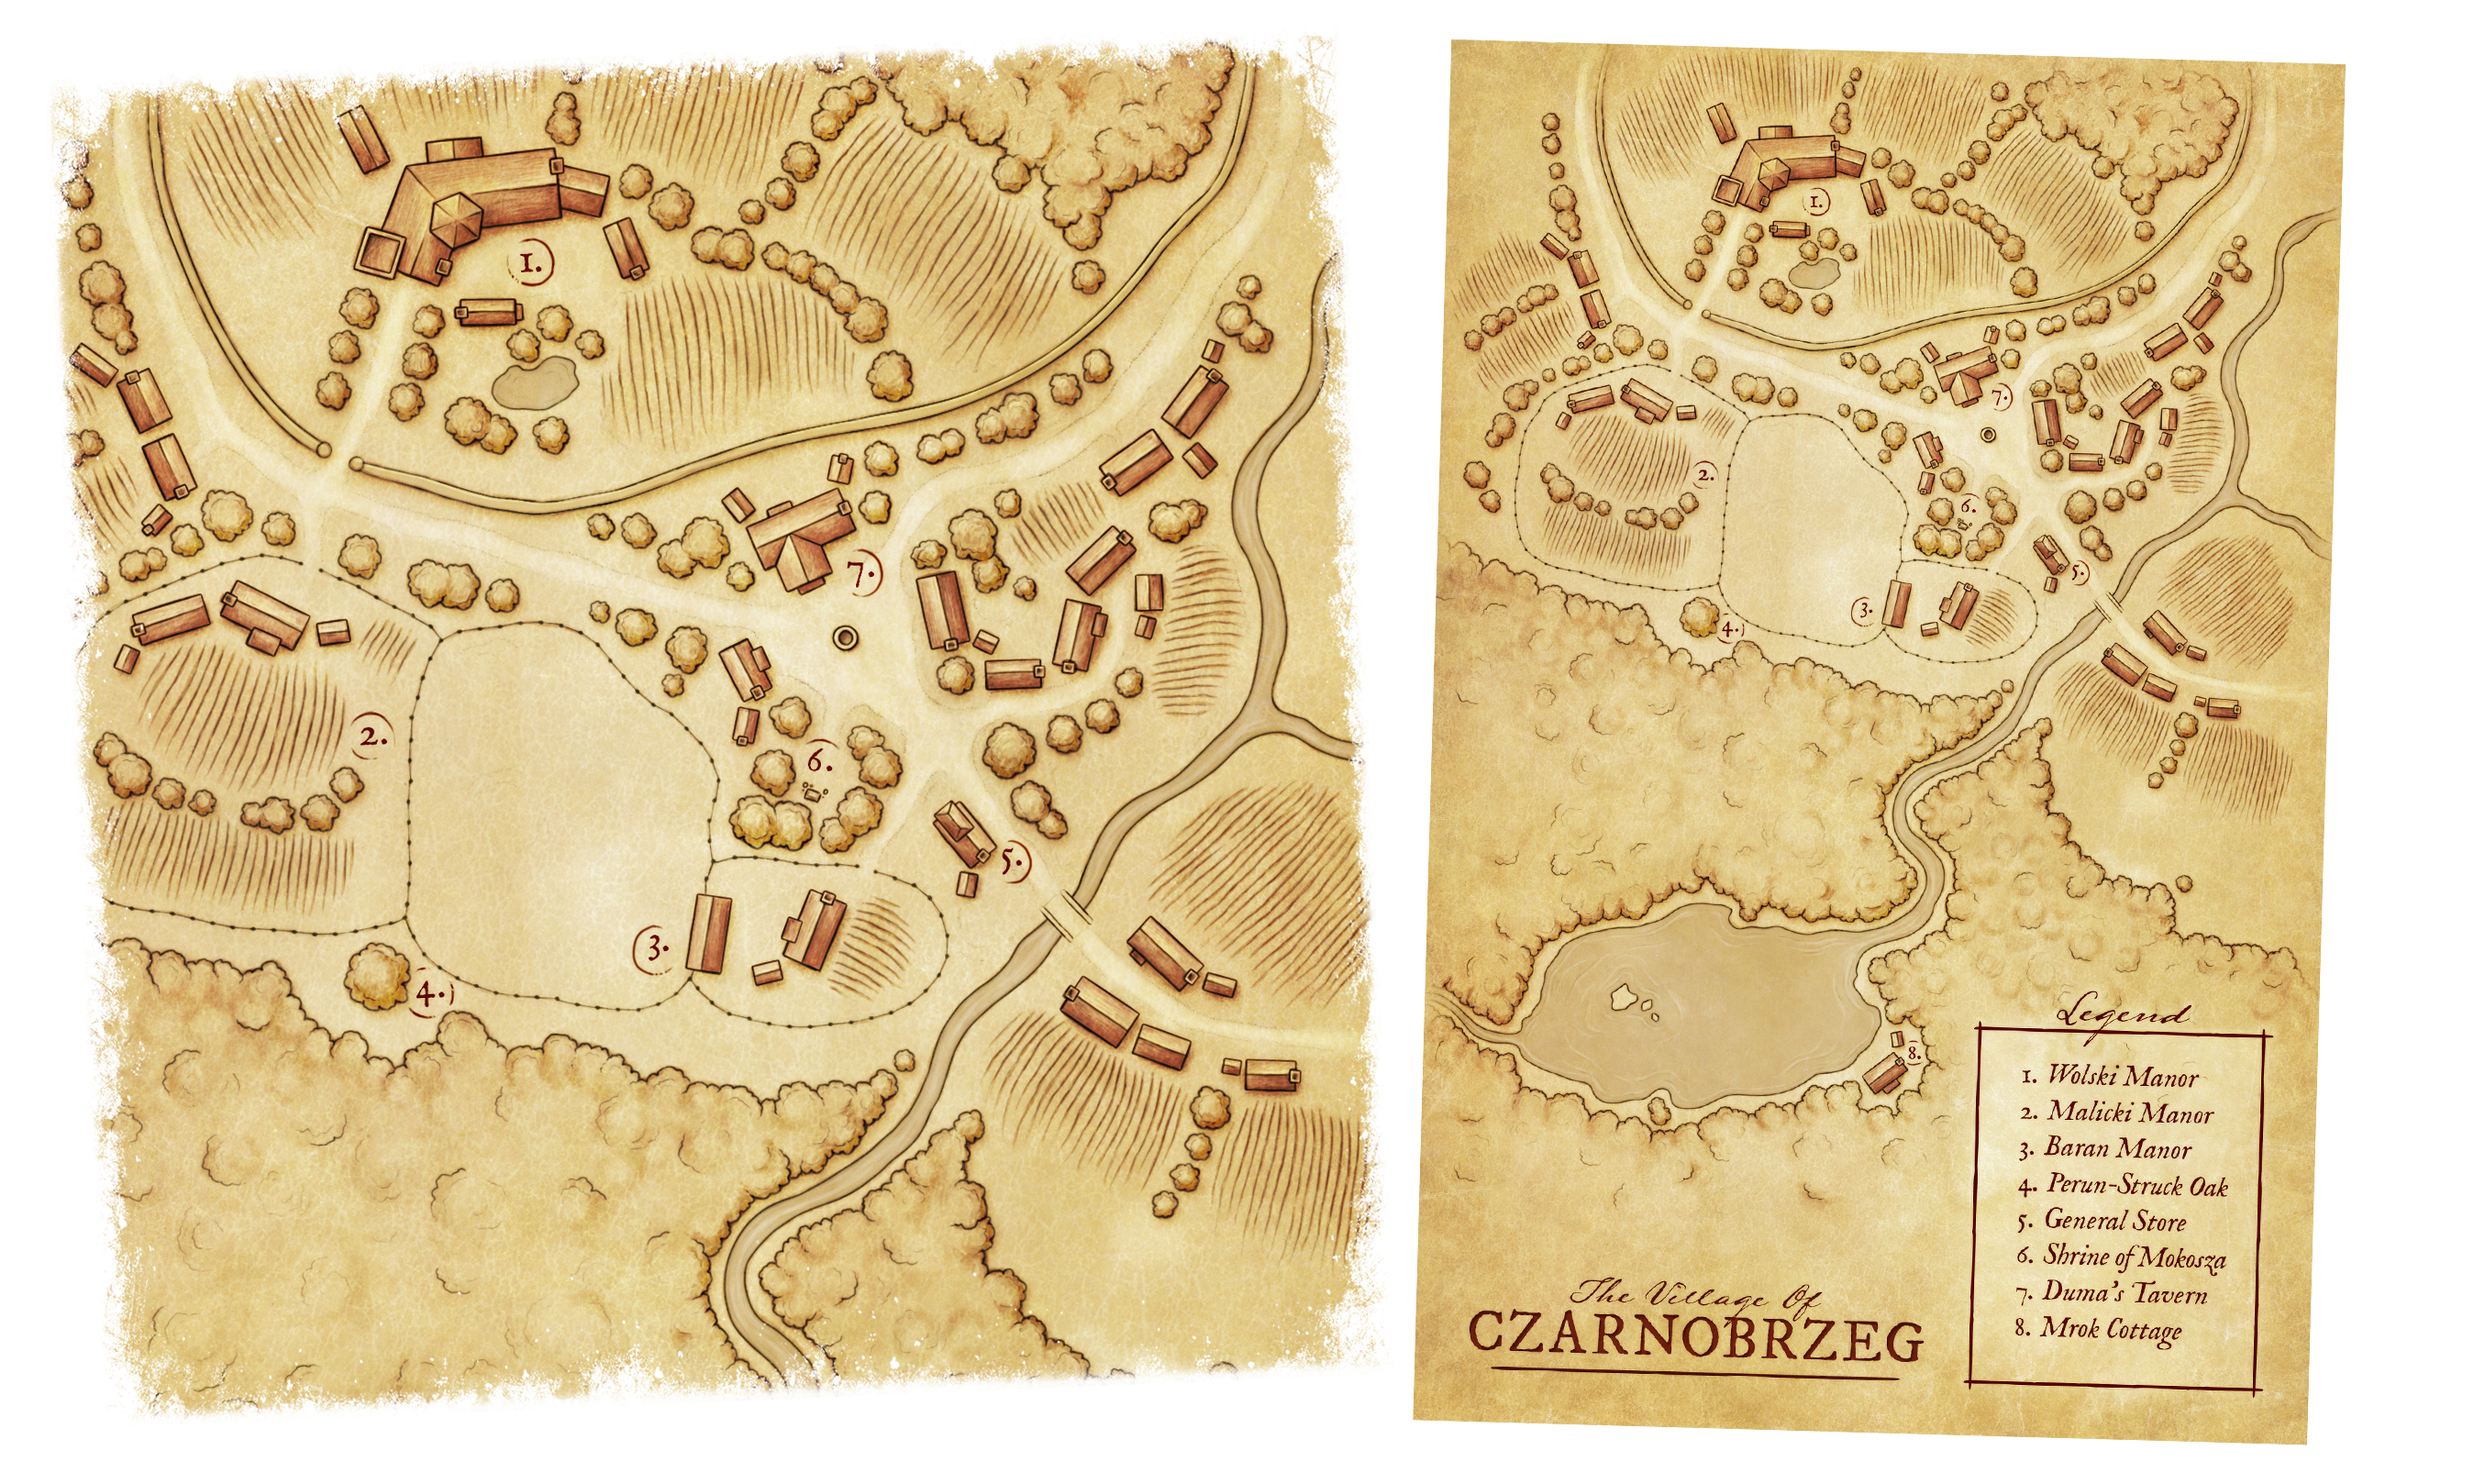 Czarnobrzeg Village